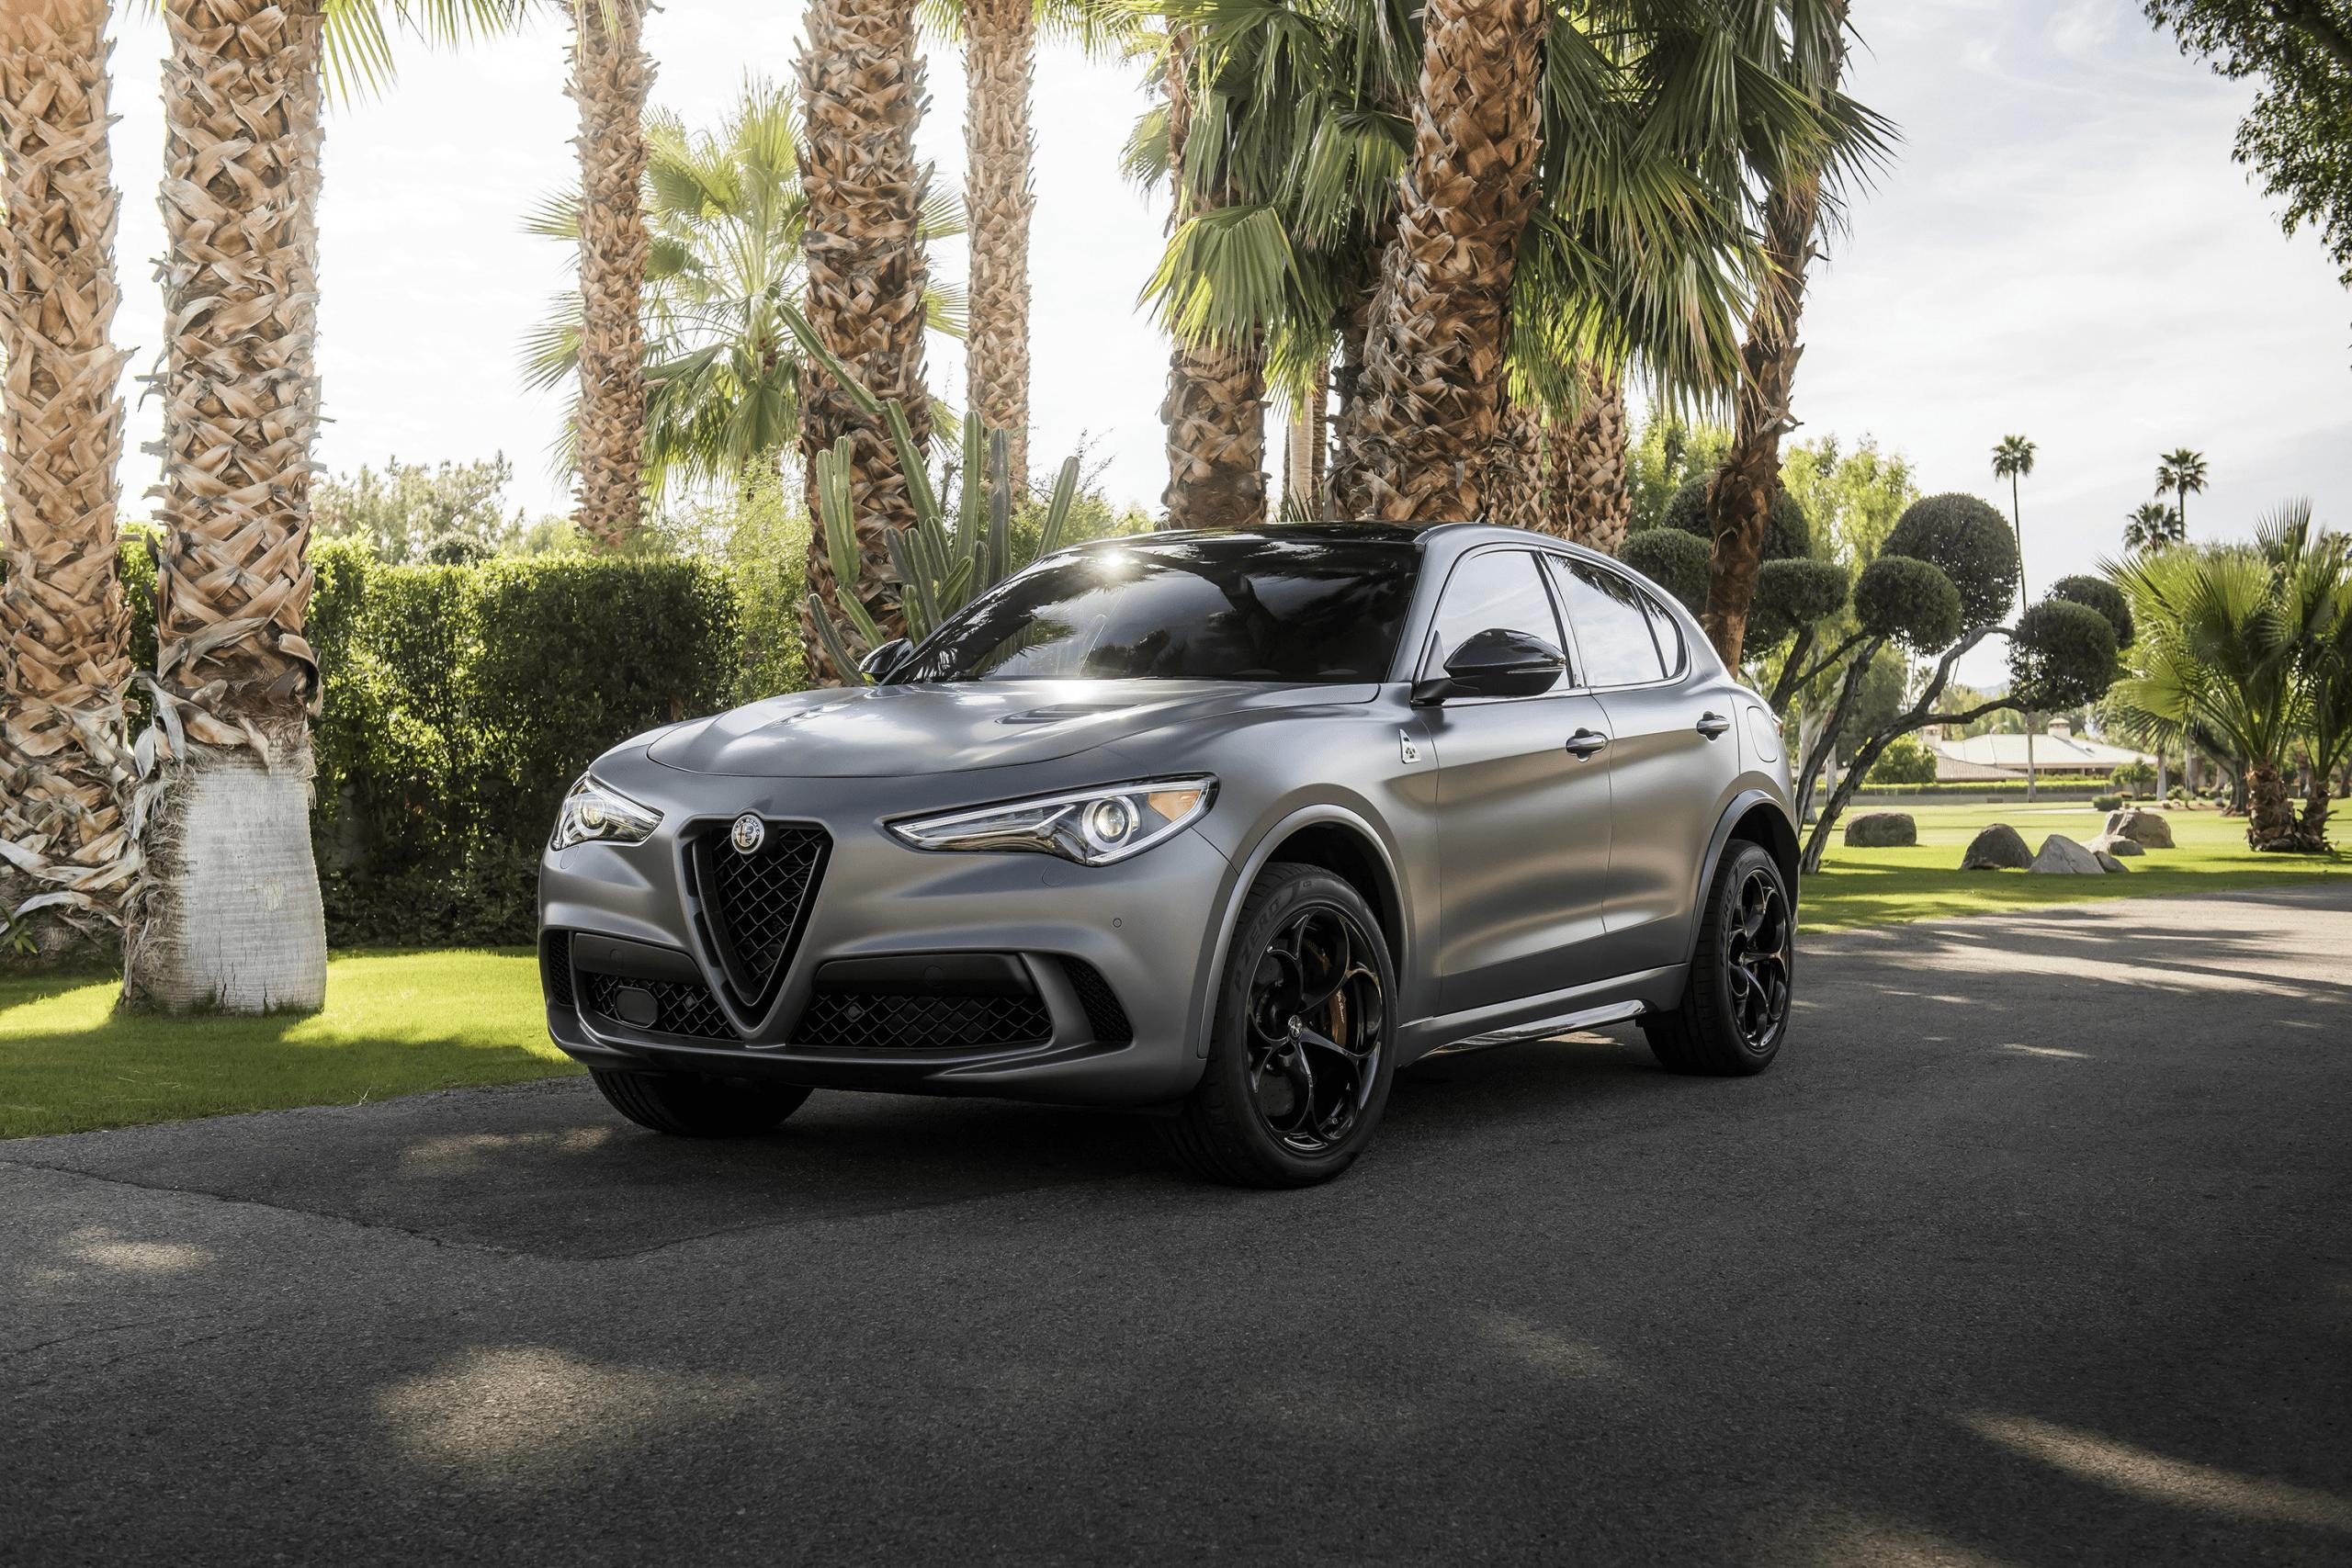 4 Alfa Romeo Duetto Reviews in 4 (With images)  Alfa romeo